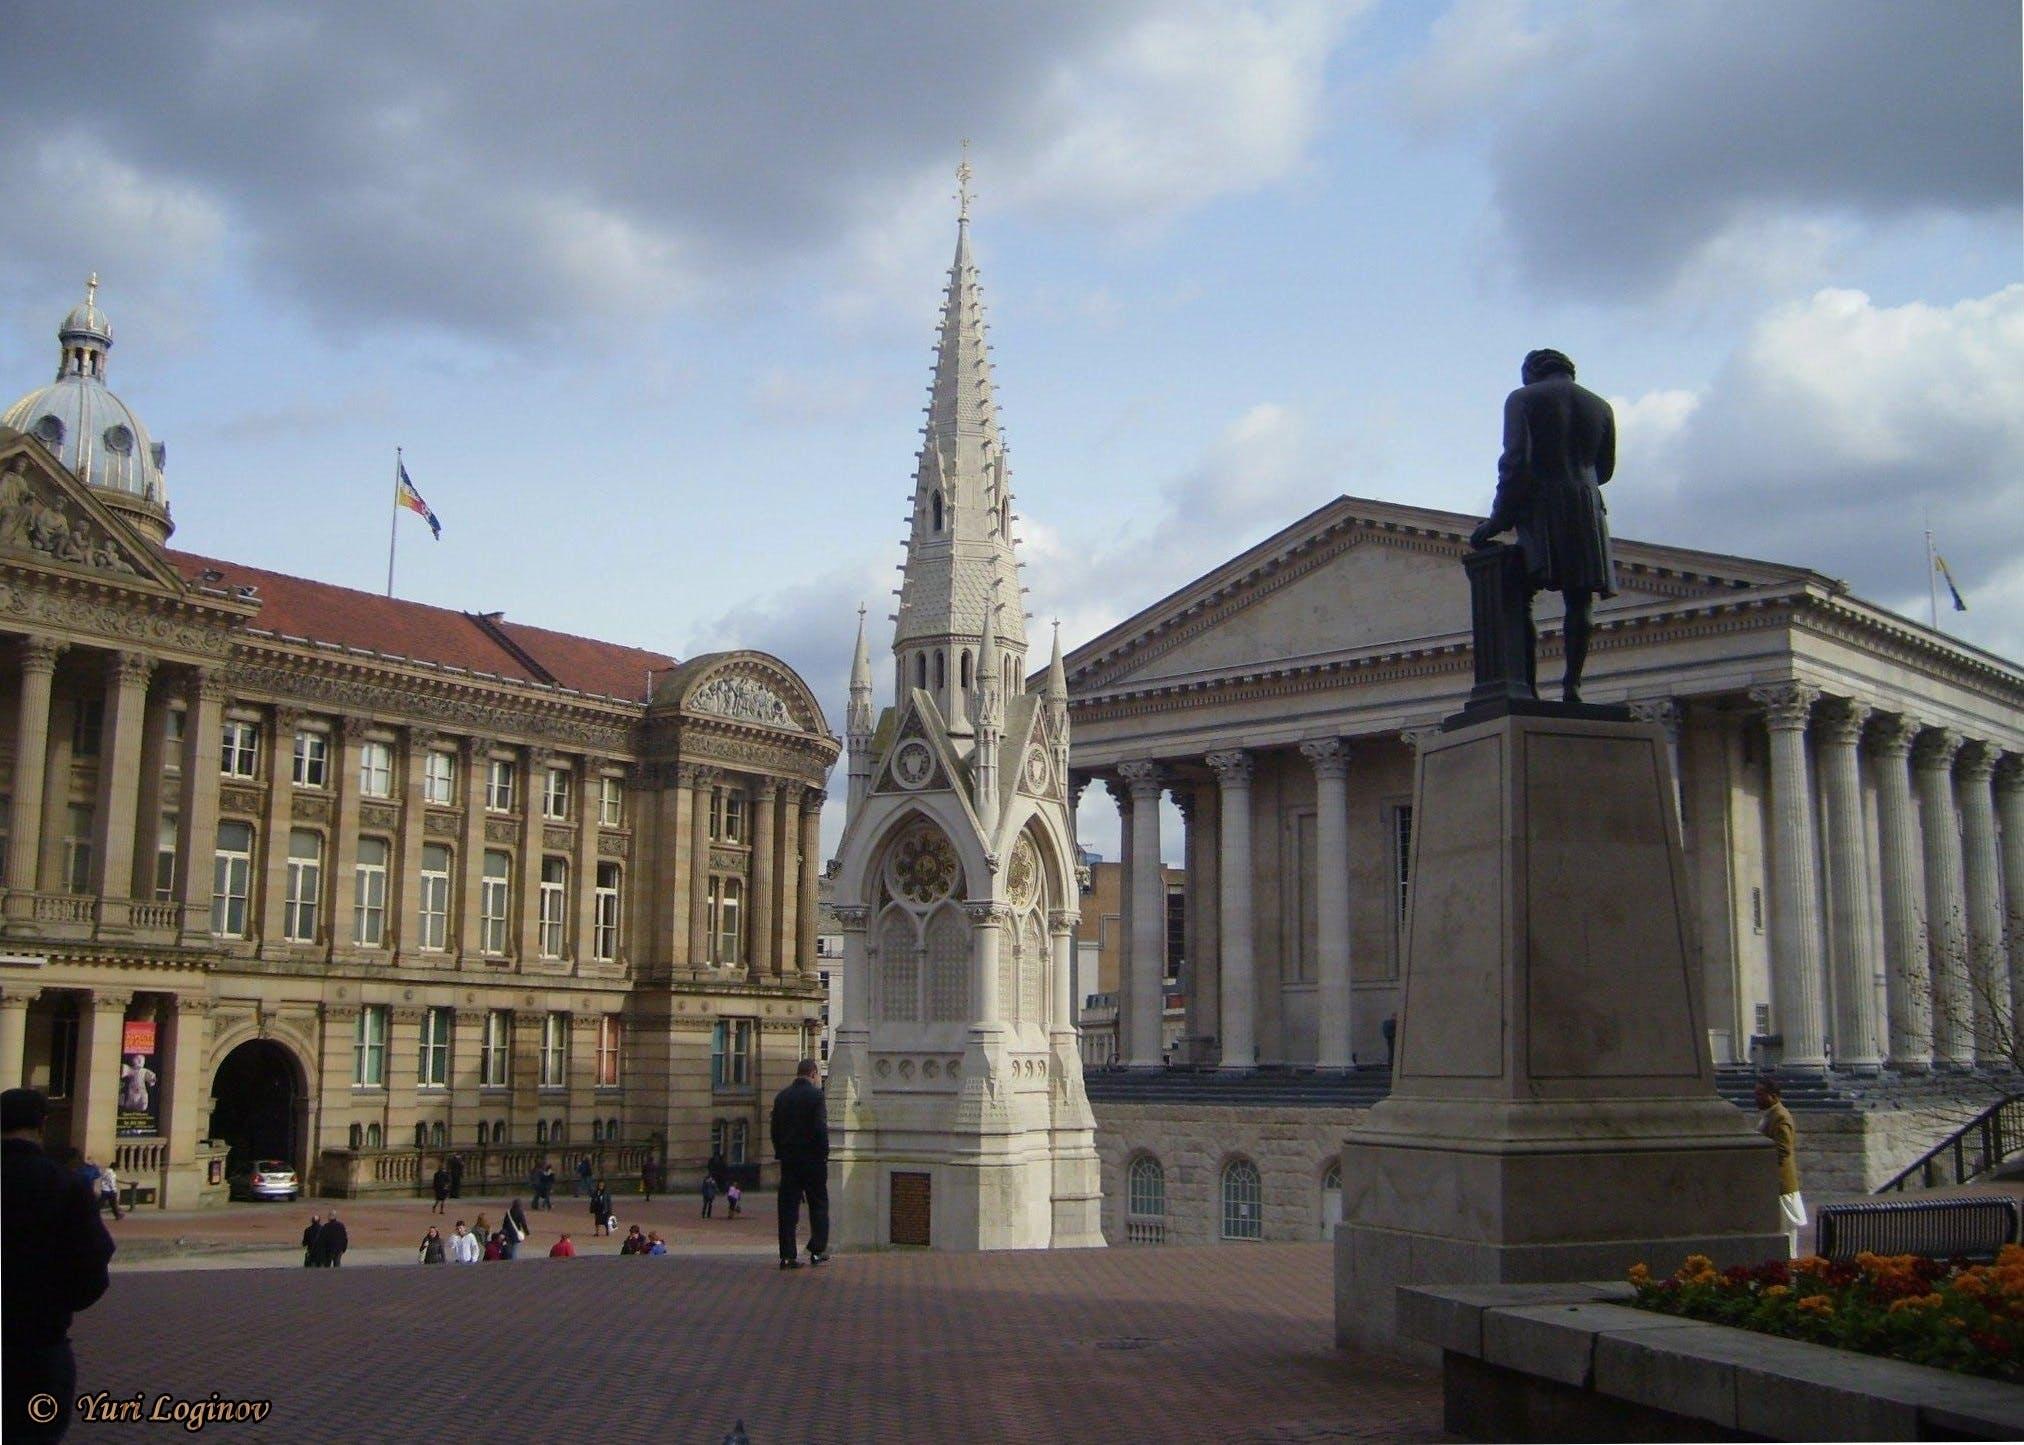 Free stock photo of england, united kingdom, birmingham, Chamberlain Square